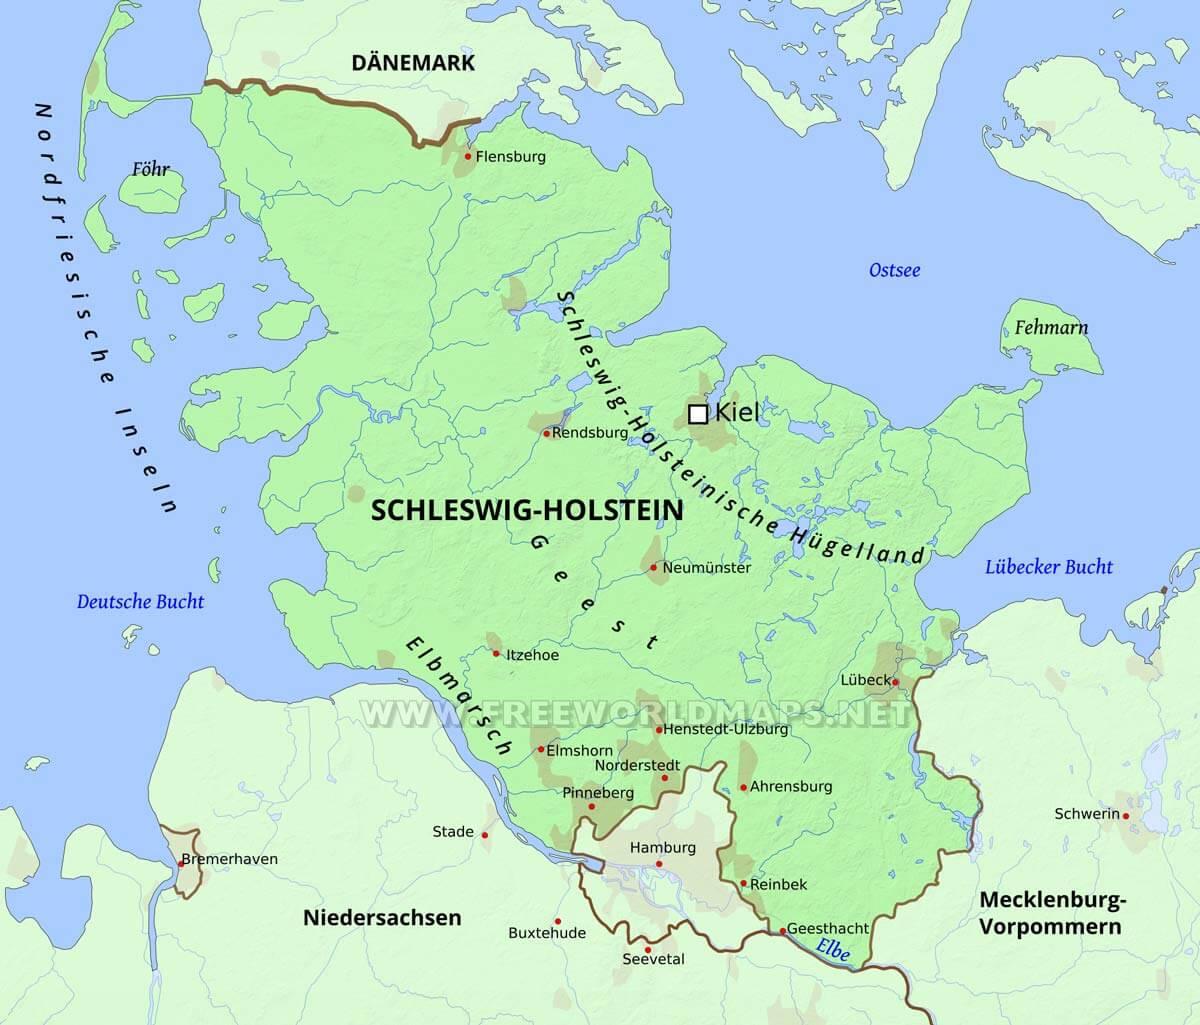 Kieler Bucht Karte.Schleswig Holstein Karte Freeworldmaps Net